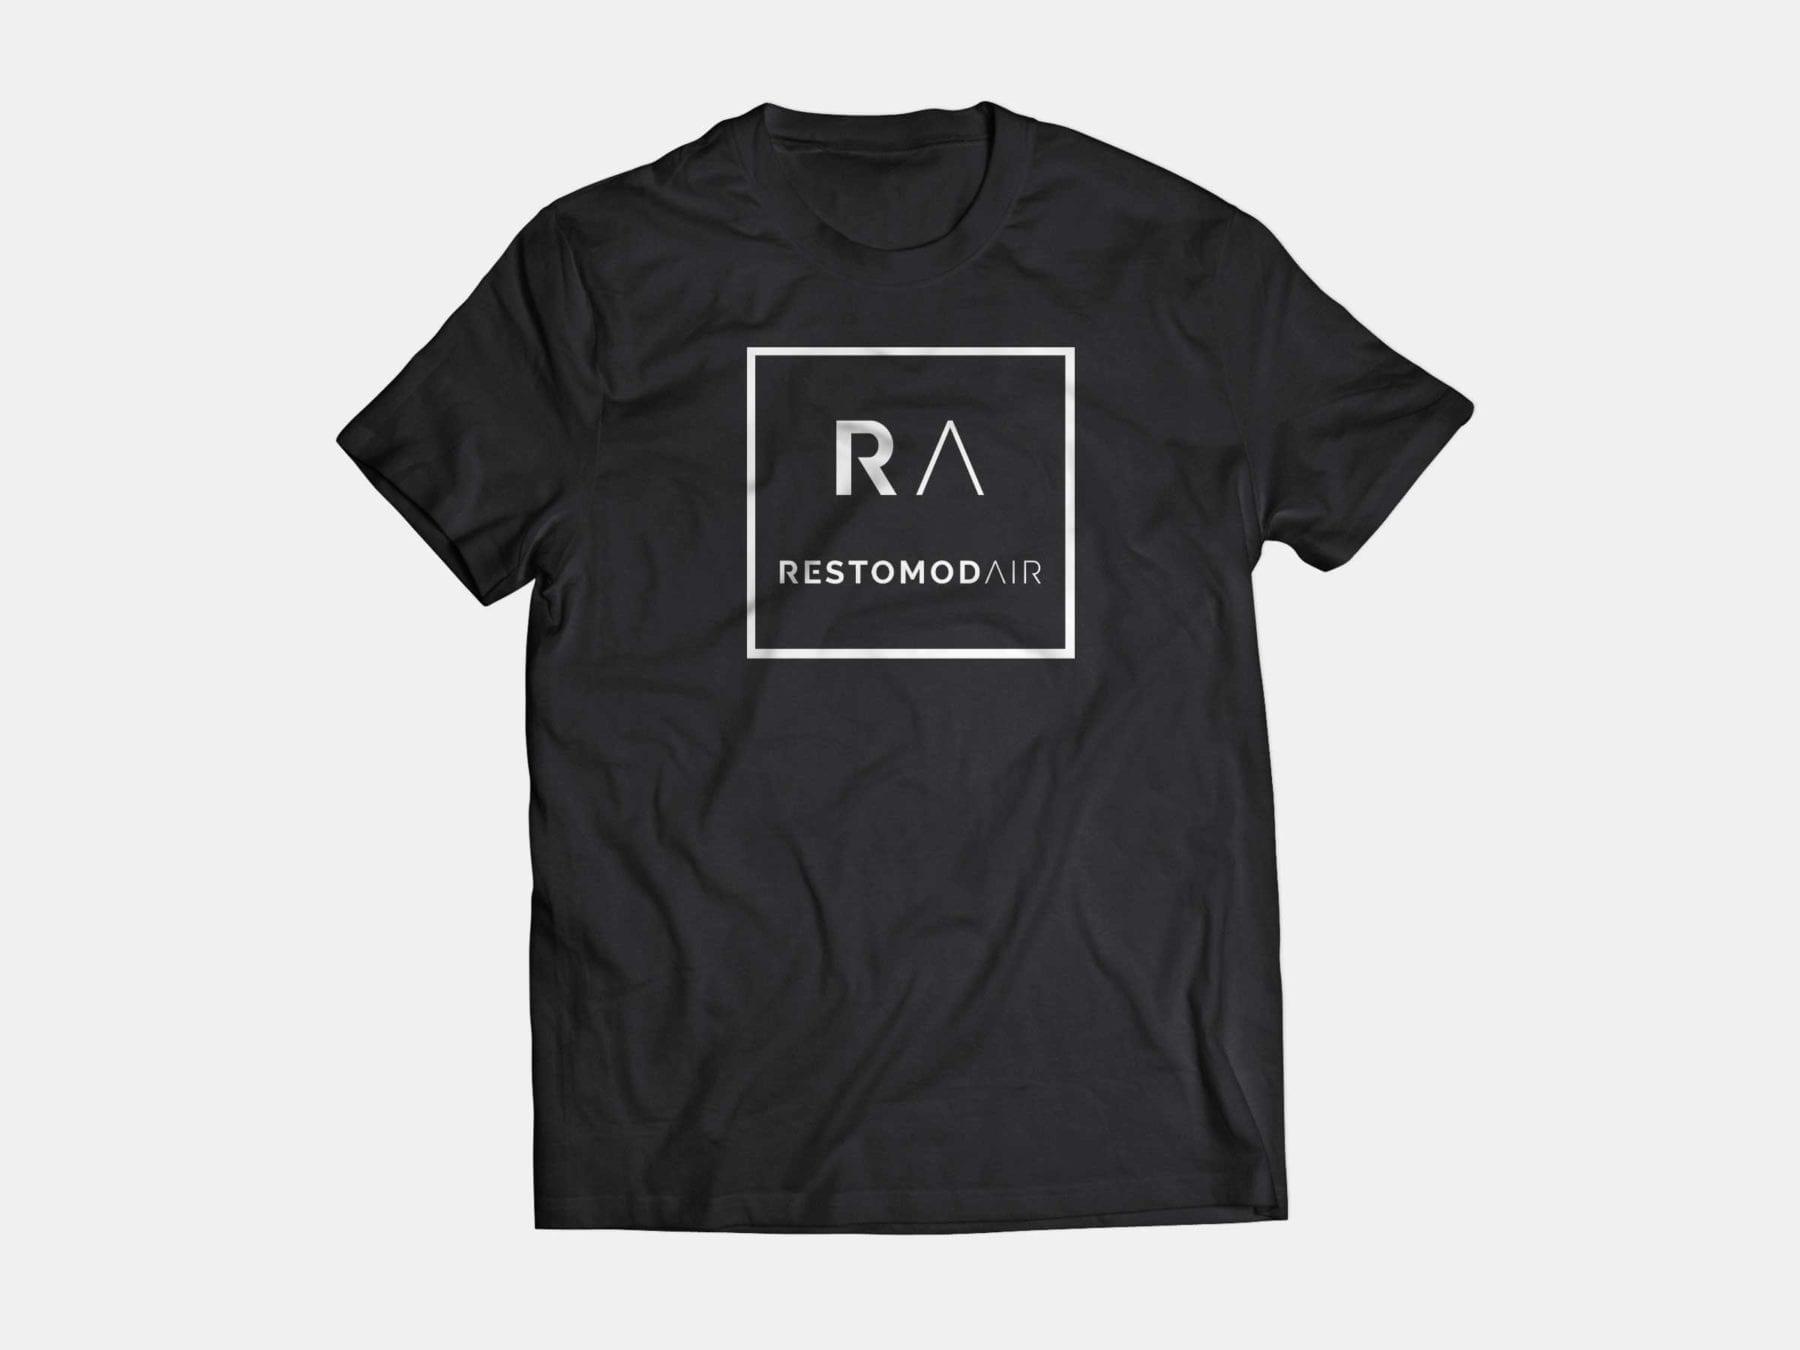 BLACK SHIRT FRONT RA